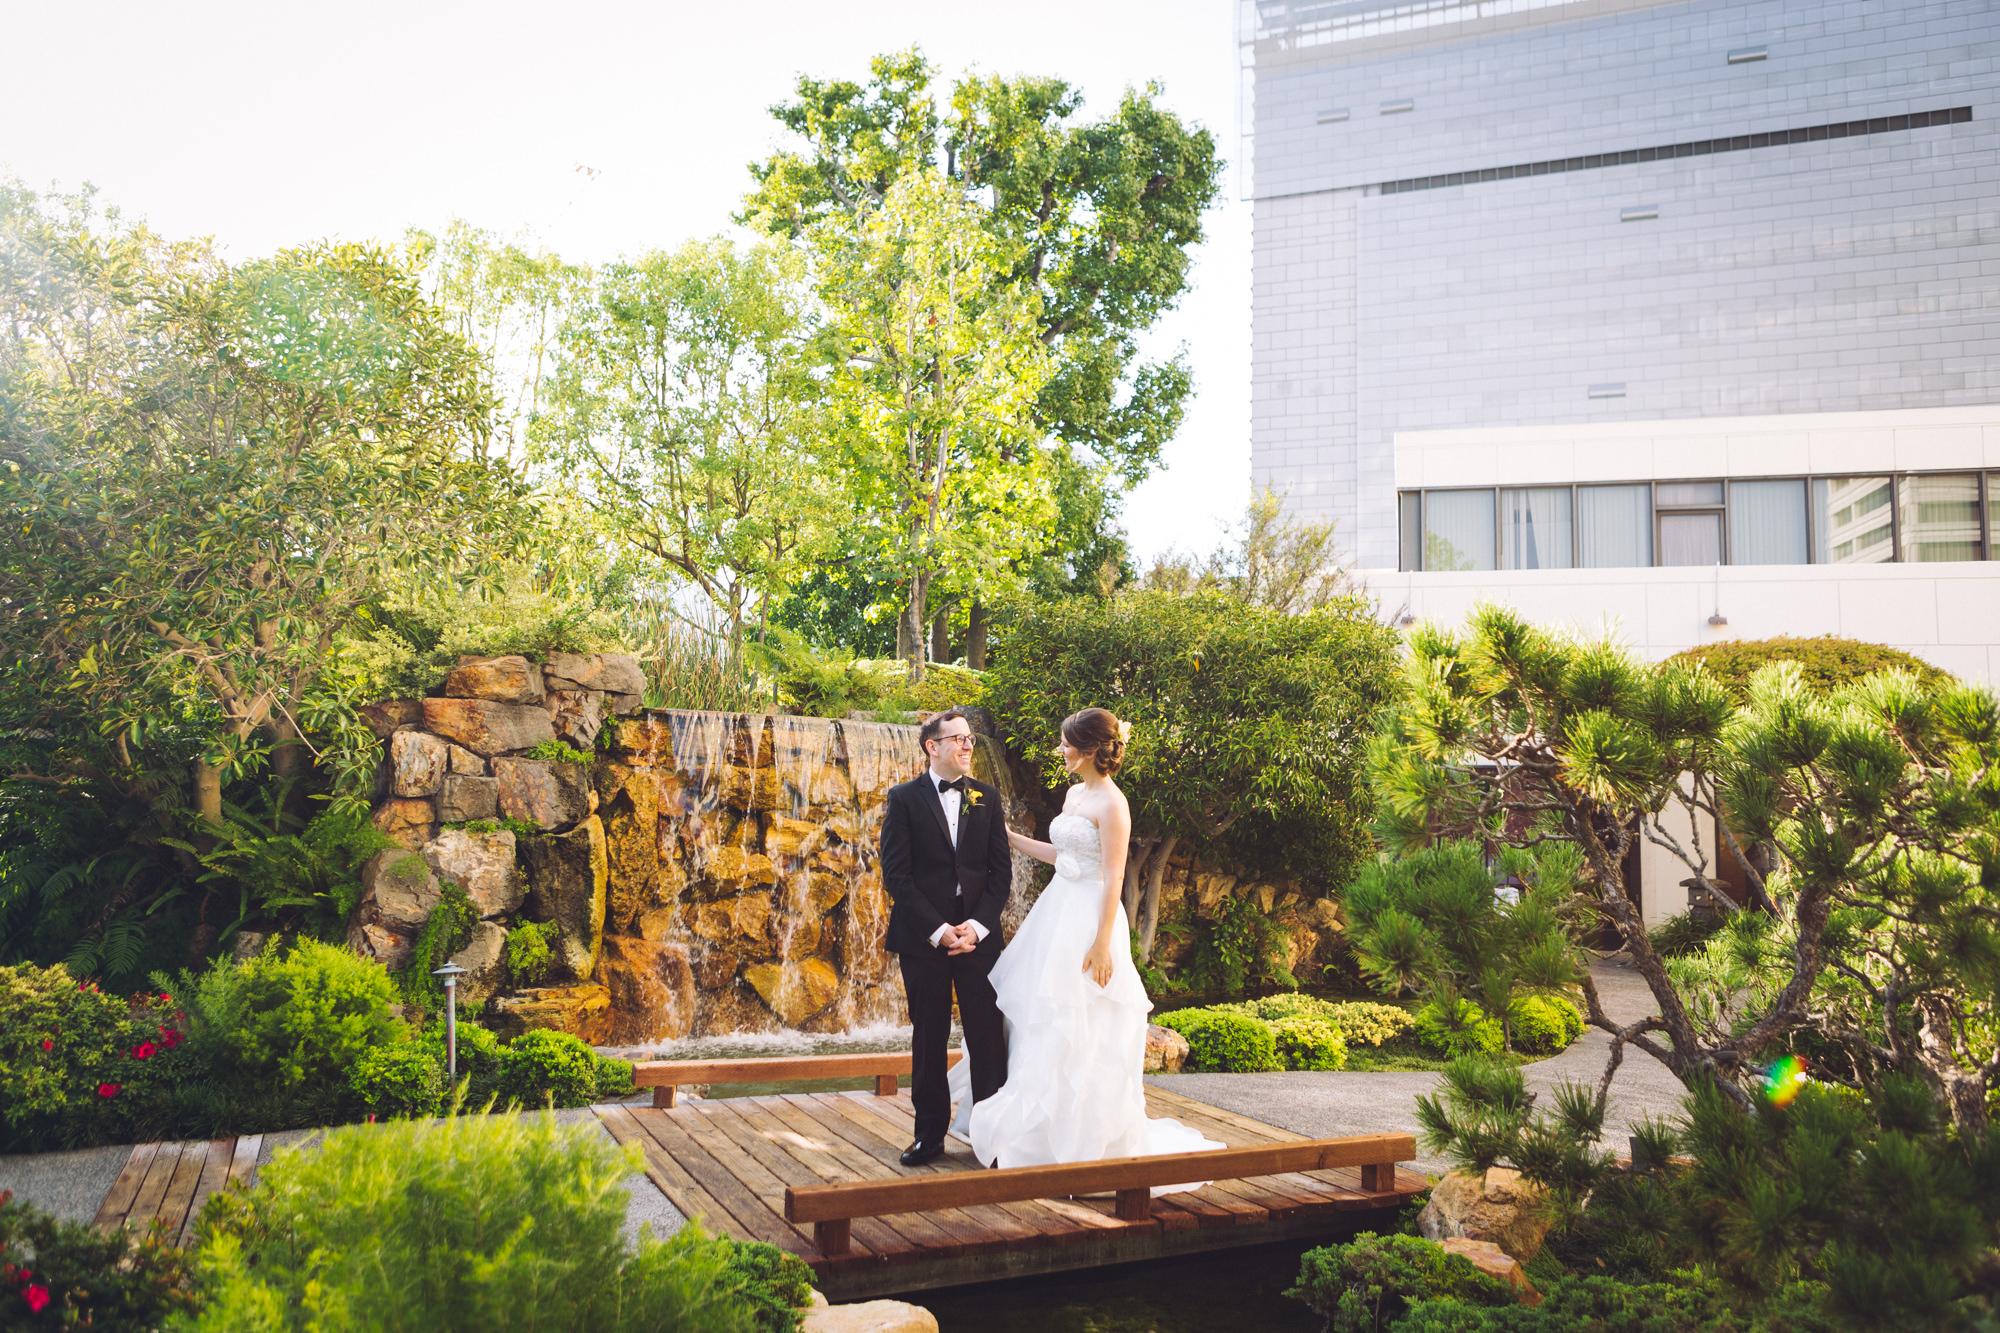 thelightandglass-wedding-engagement-photography-044.jpg